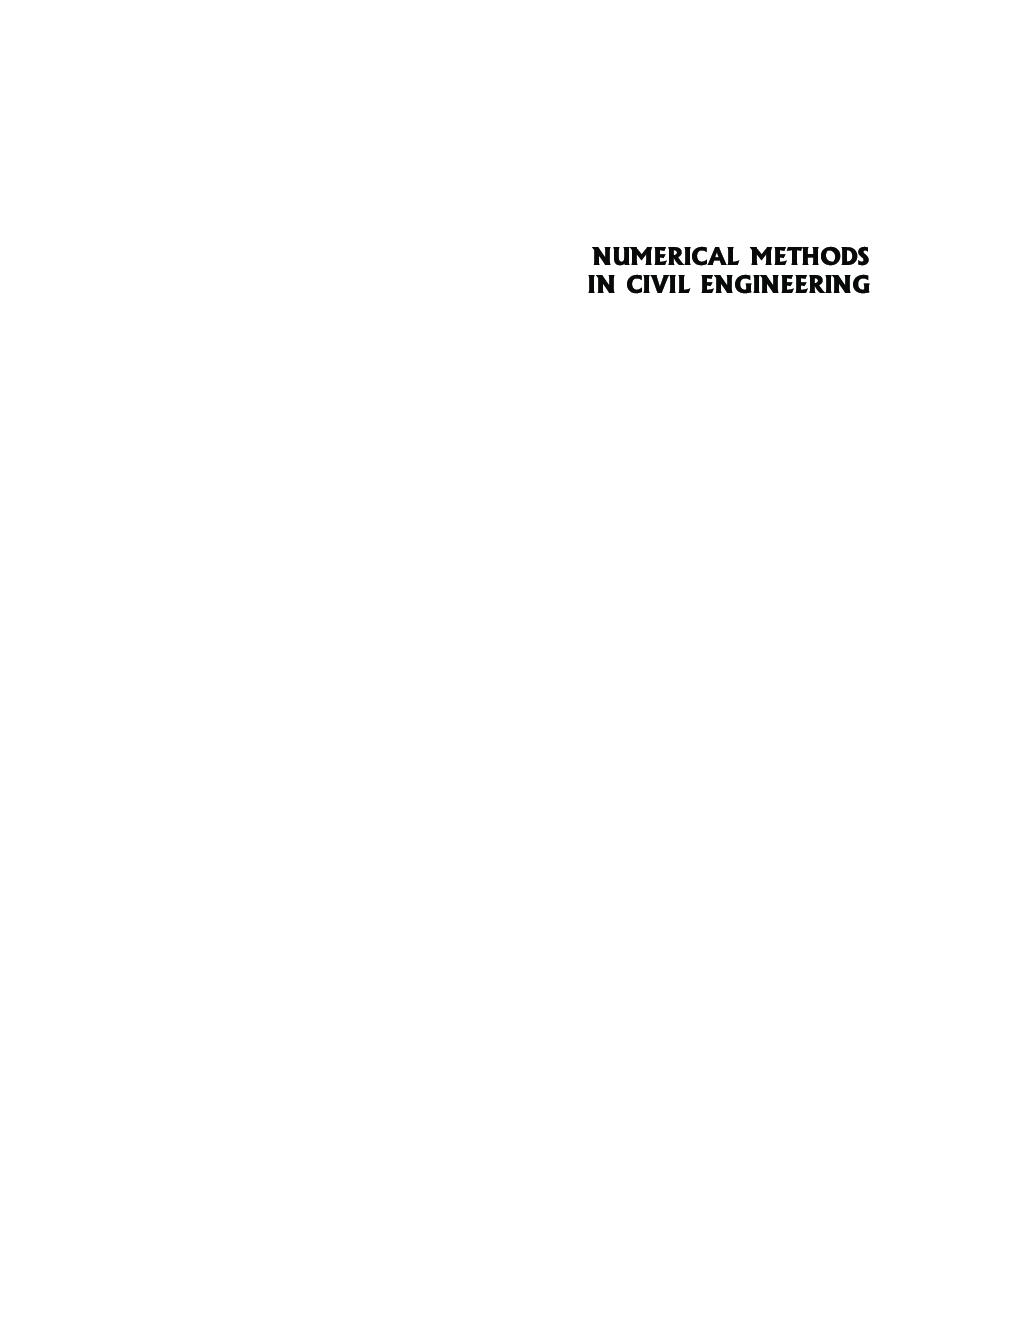 pdf Школоведение: Курс лекций